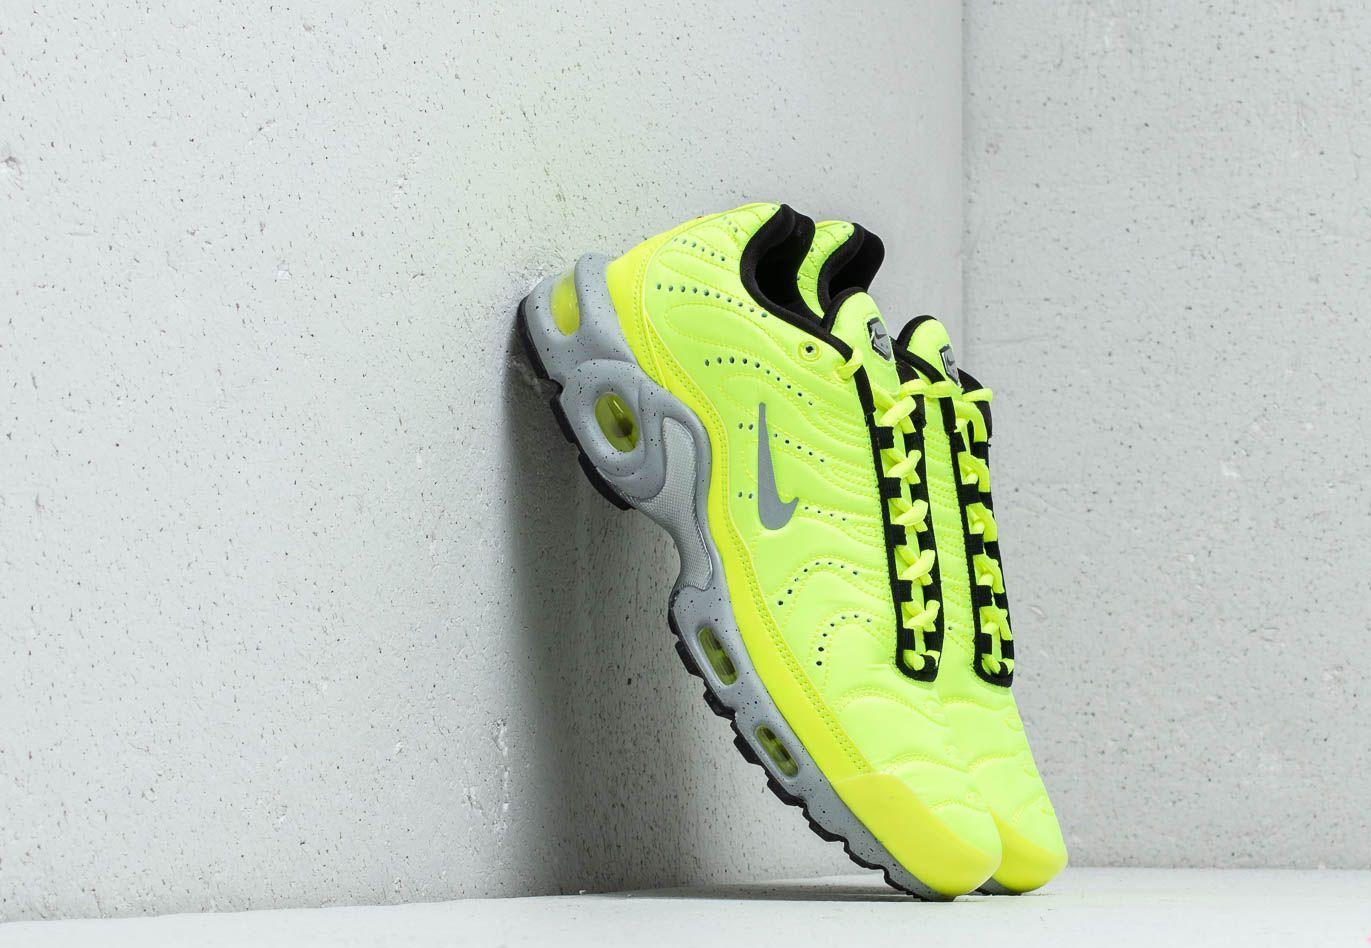 5061bc8796b4 Lyst - Nike Air Max Plus Premium Volt  Matte Silver-wolf Grey in ...